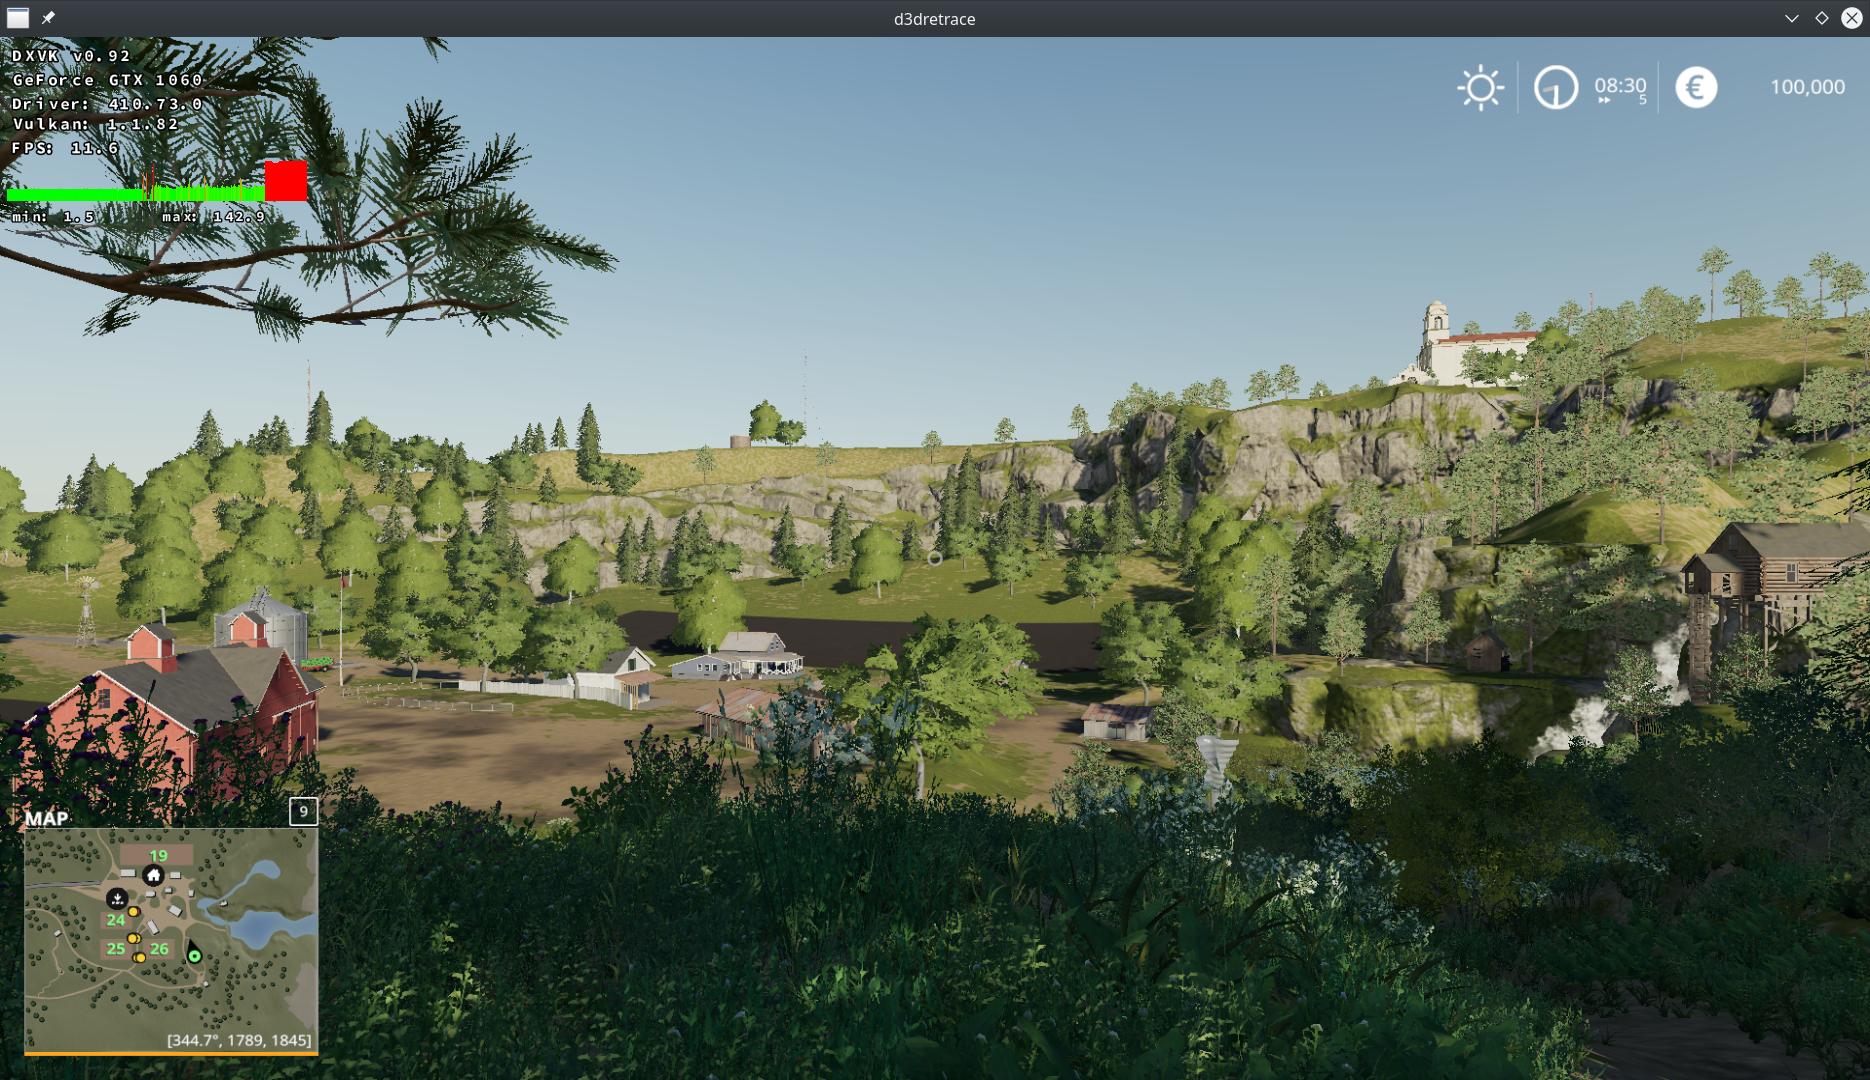 Farming Simulator 19 black screen with nvidia (optimus